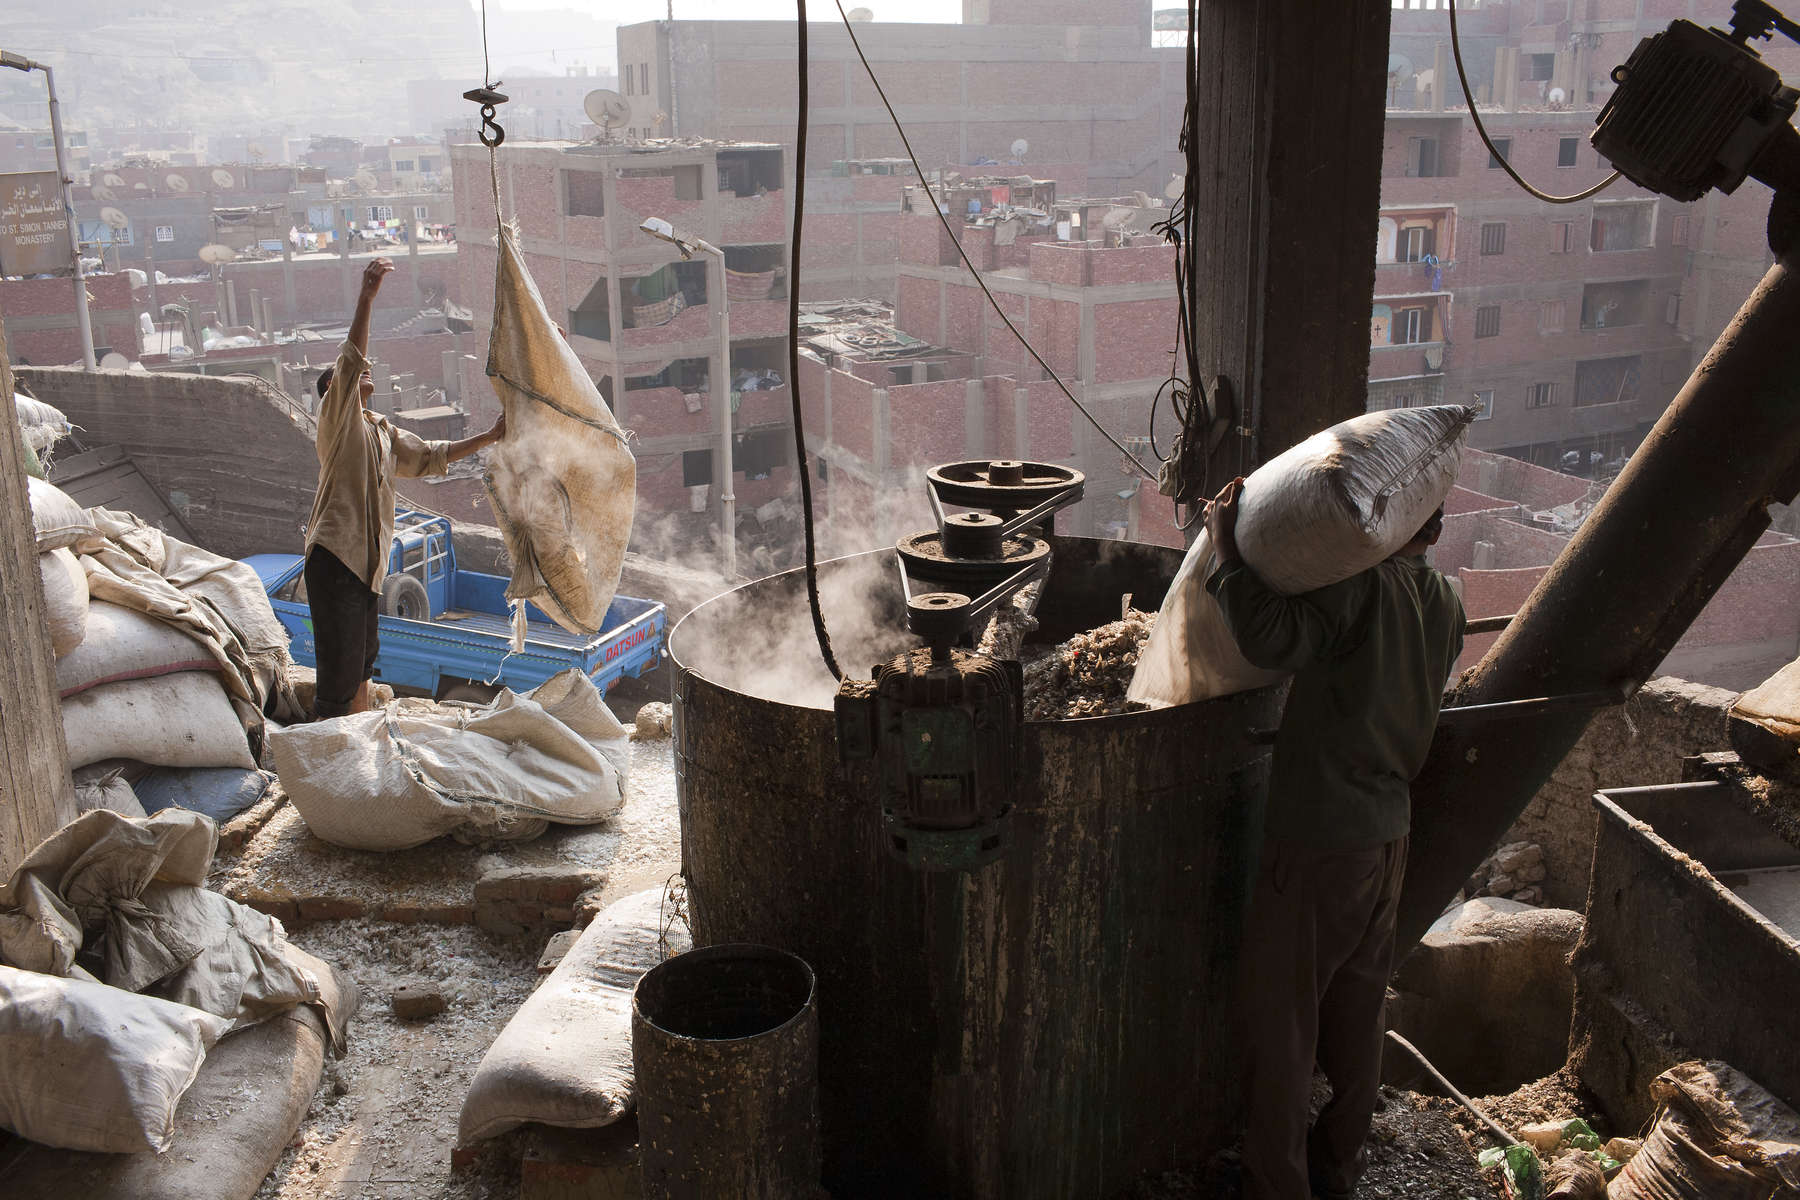 Zabaleen of Moqqatam - Dust